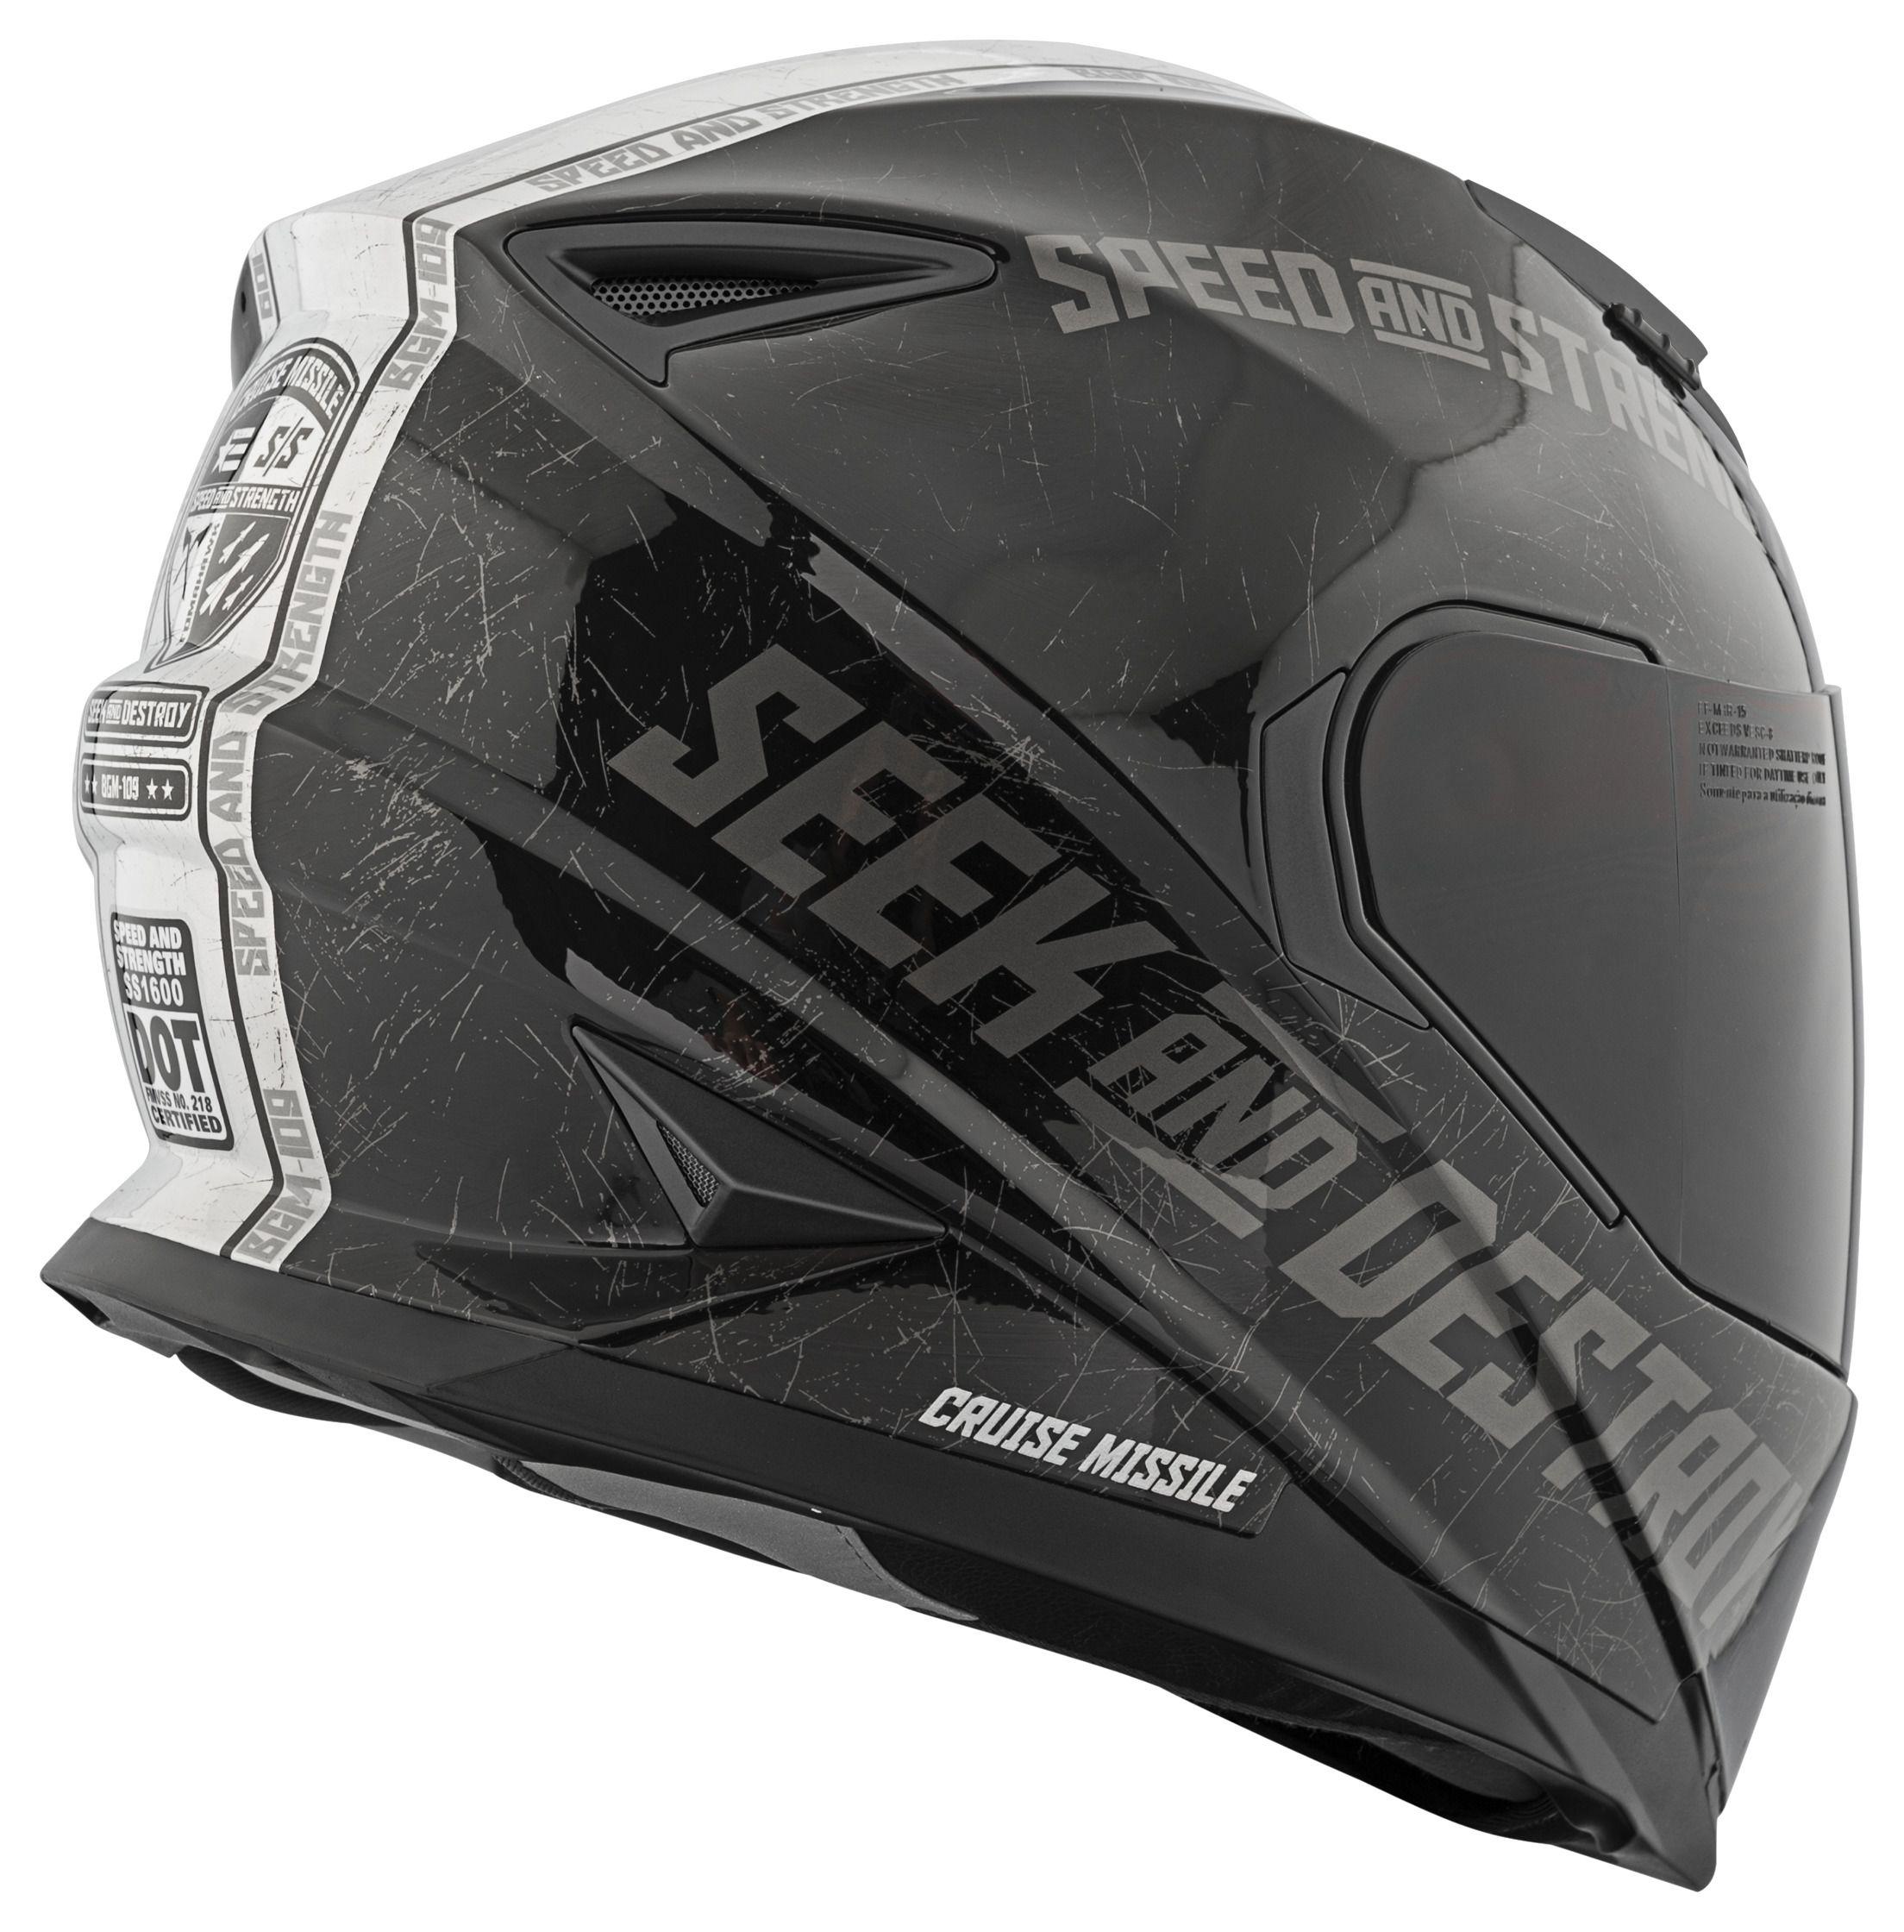 speedand_strength_ss1600_cruise_missile_helmet